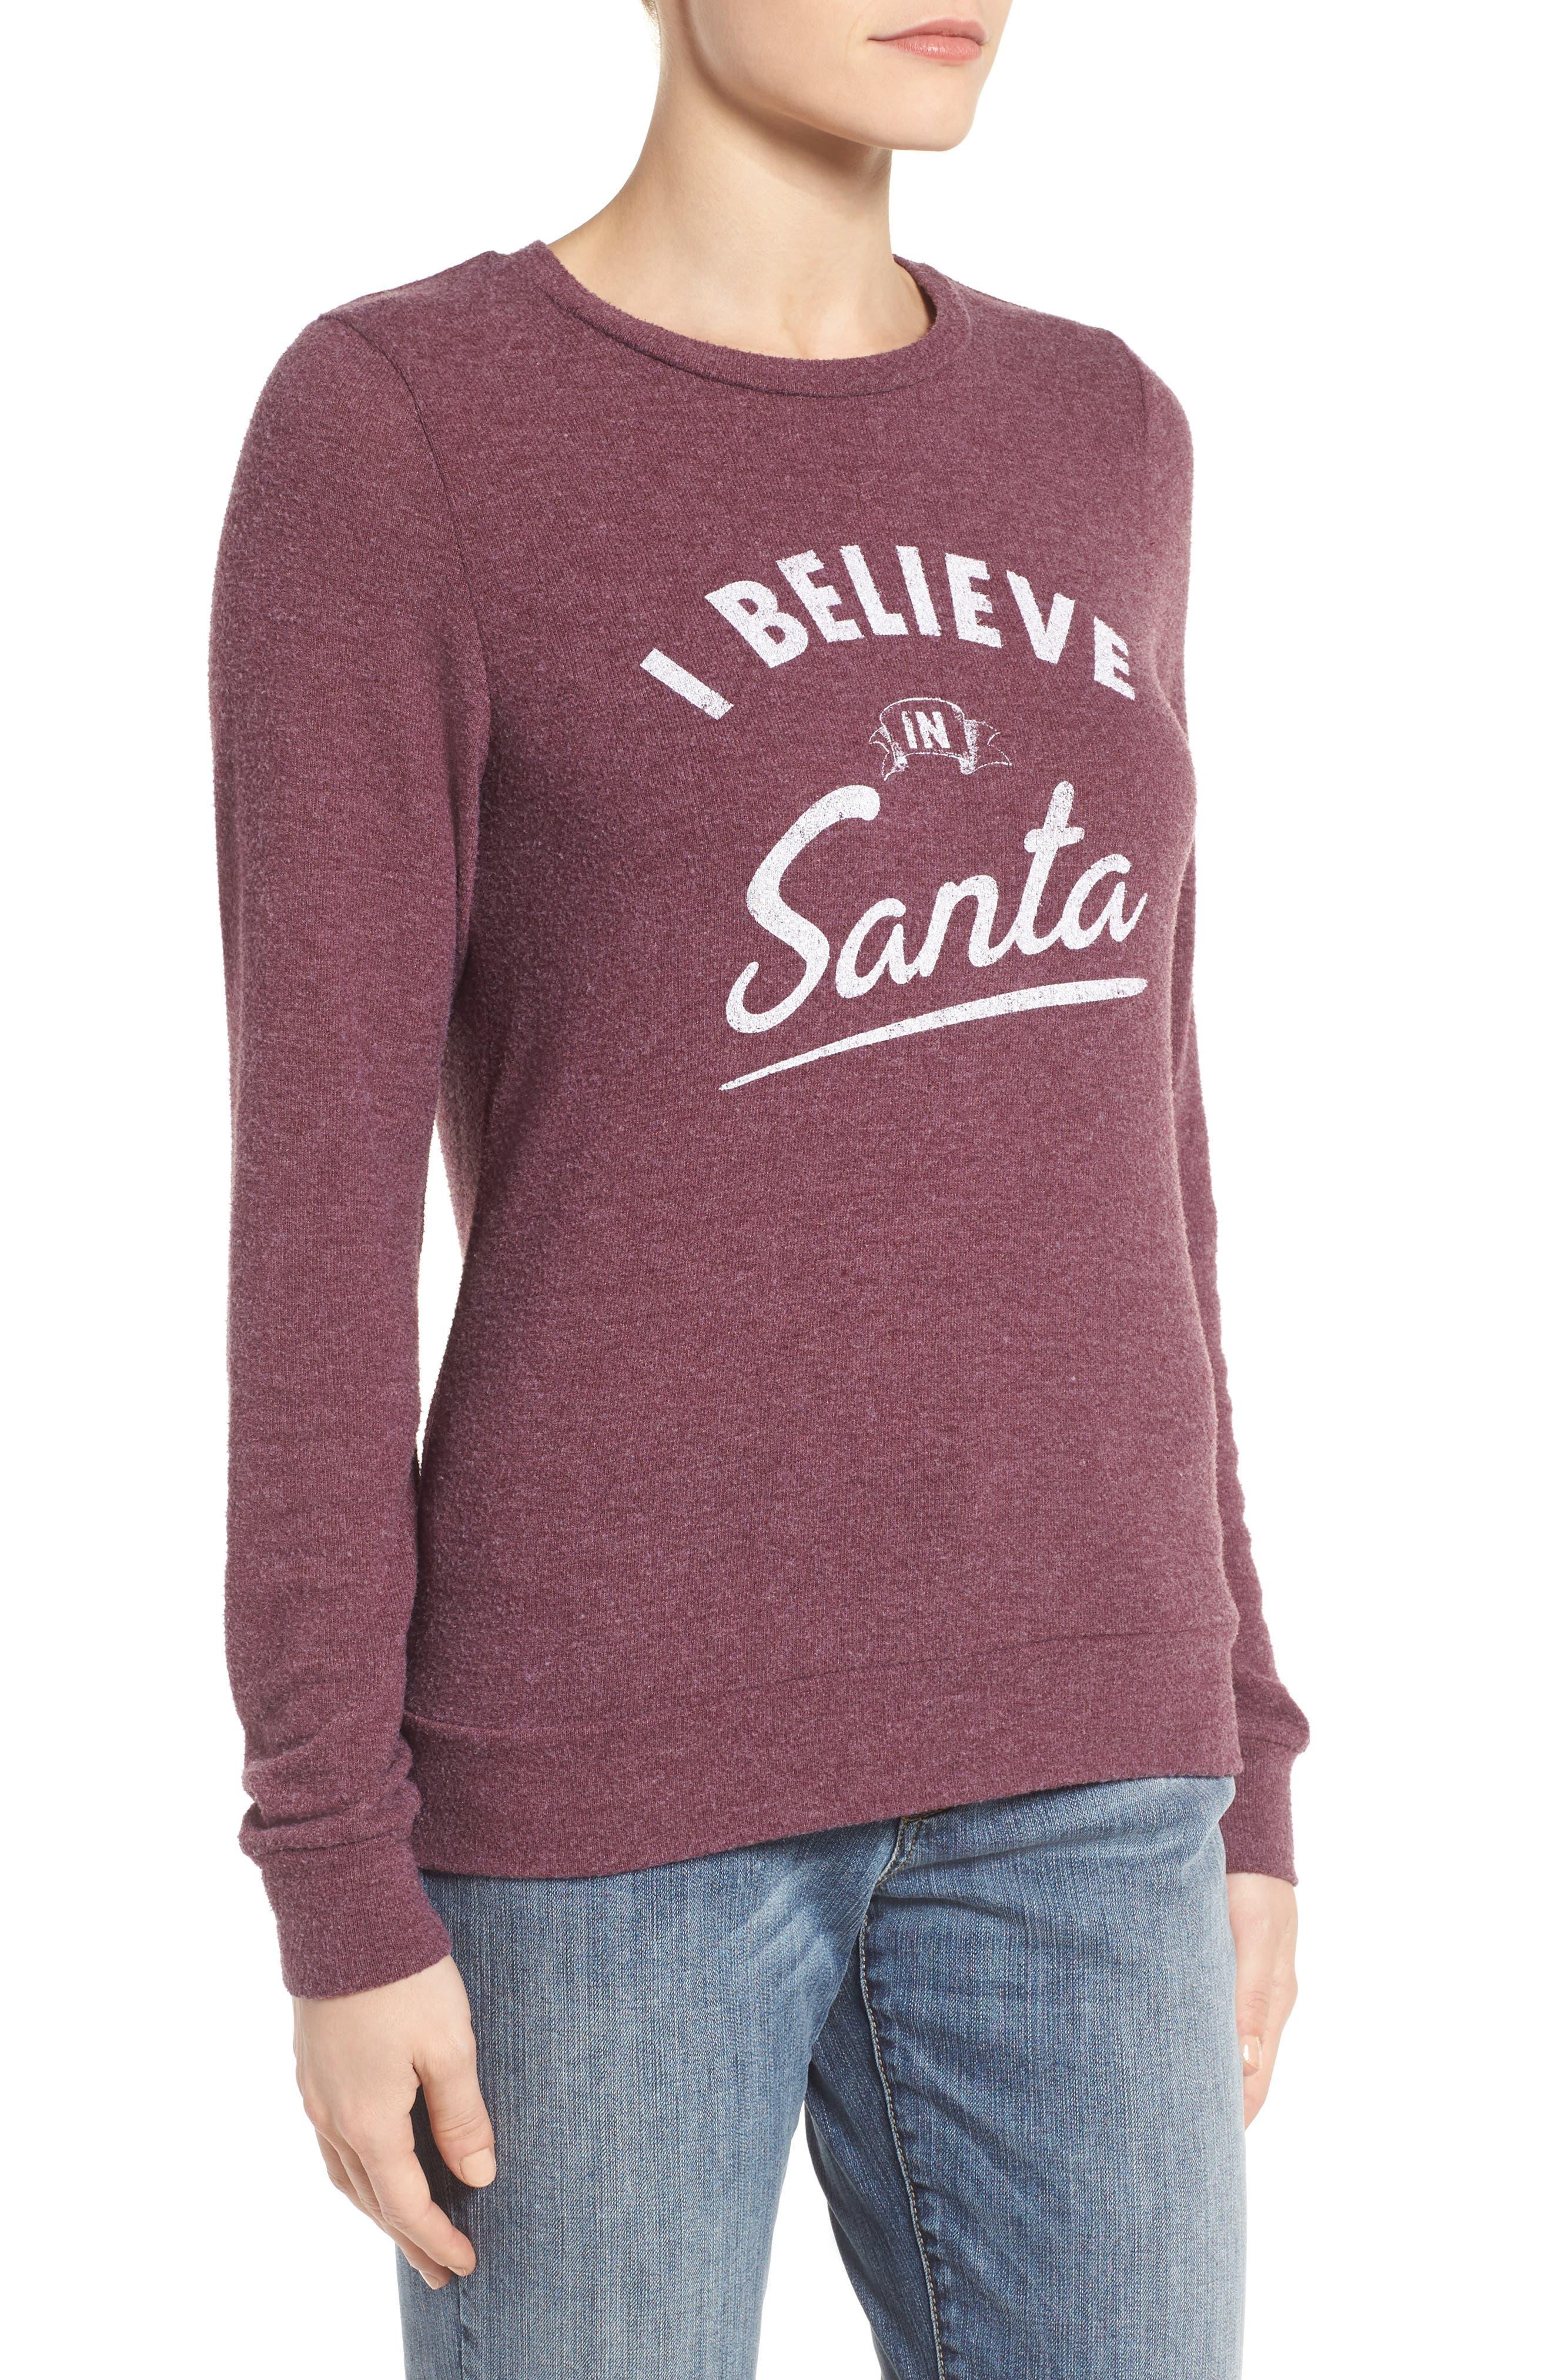 I Believe in Santa Sweatshirt,                             Alternate thumbnail 3, color,                             930